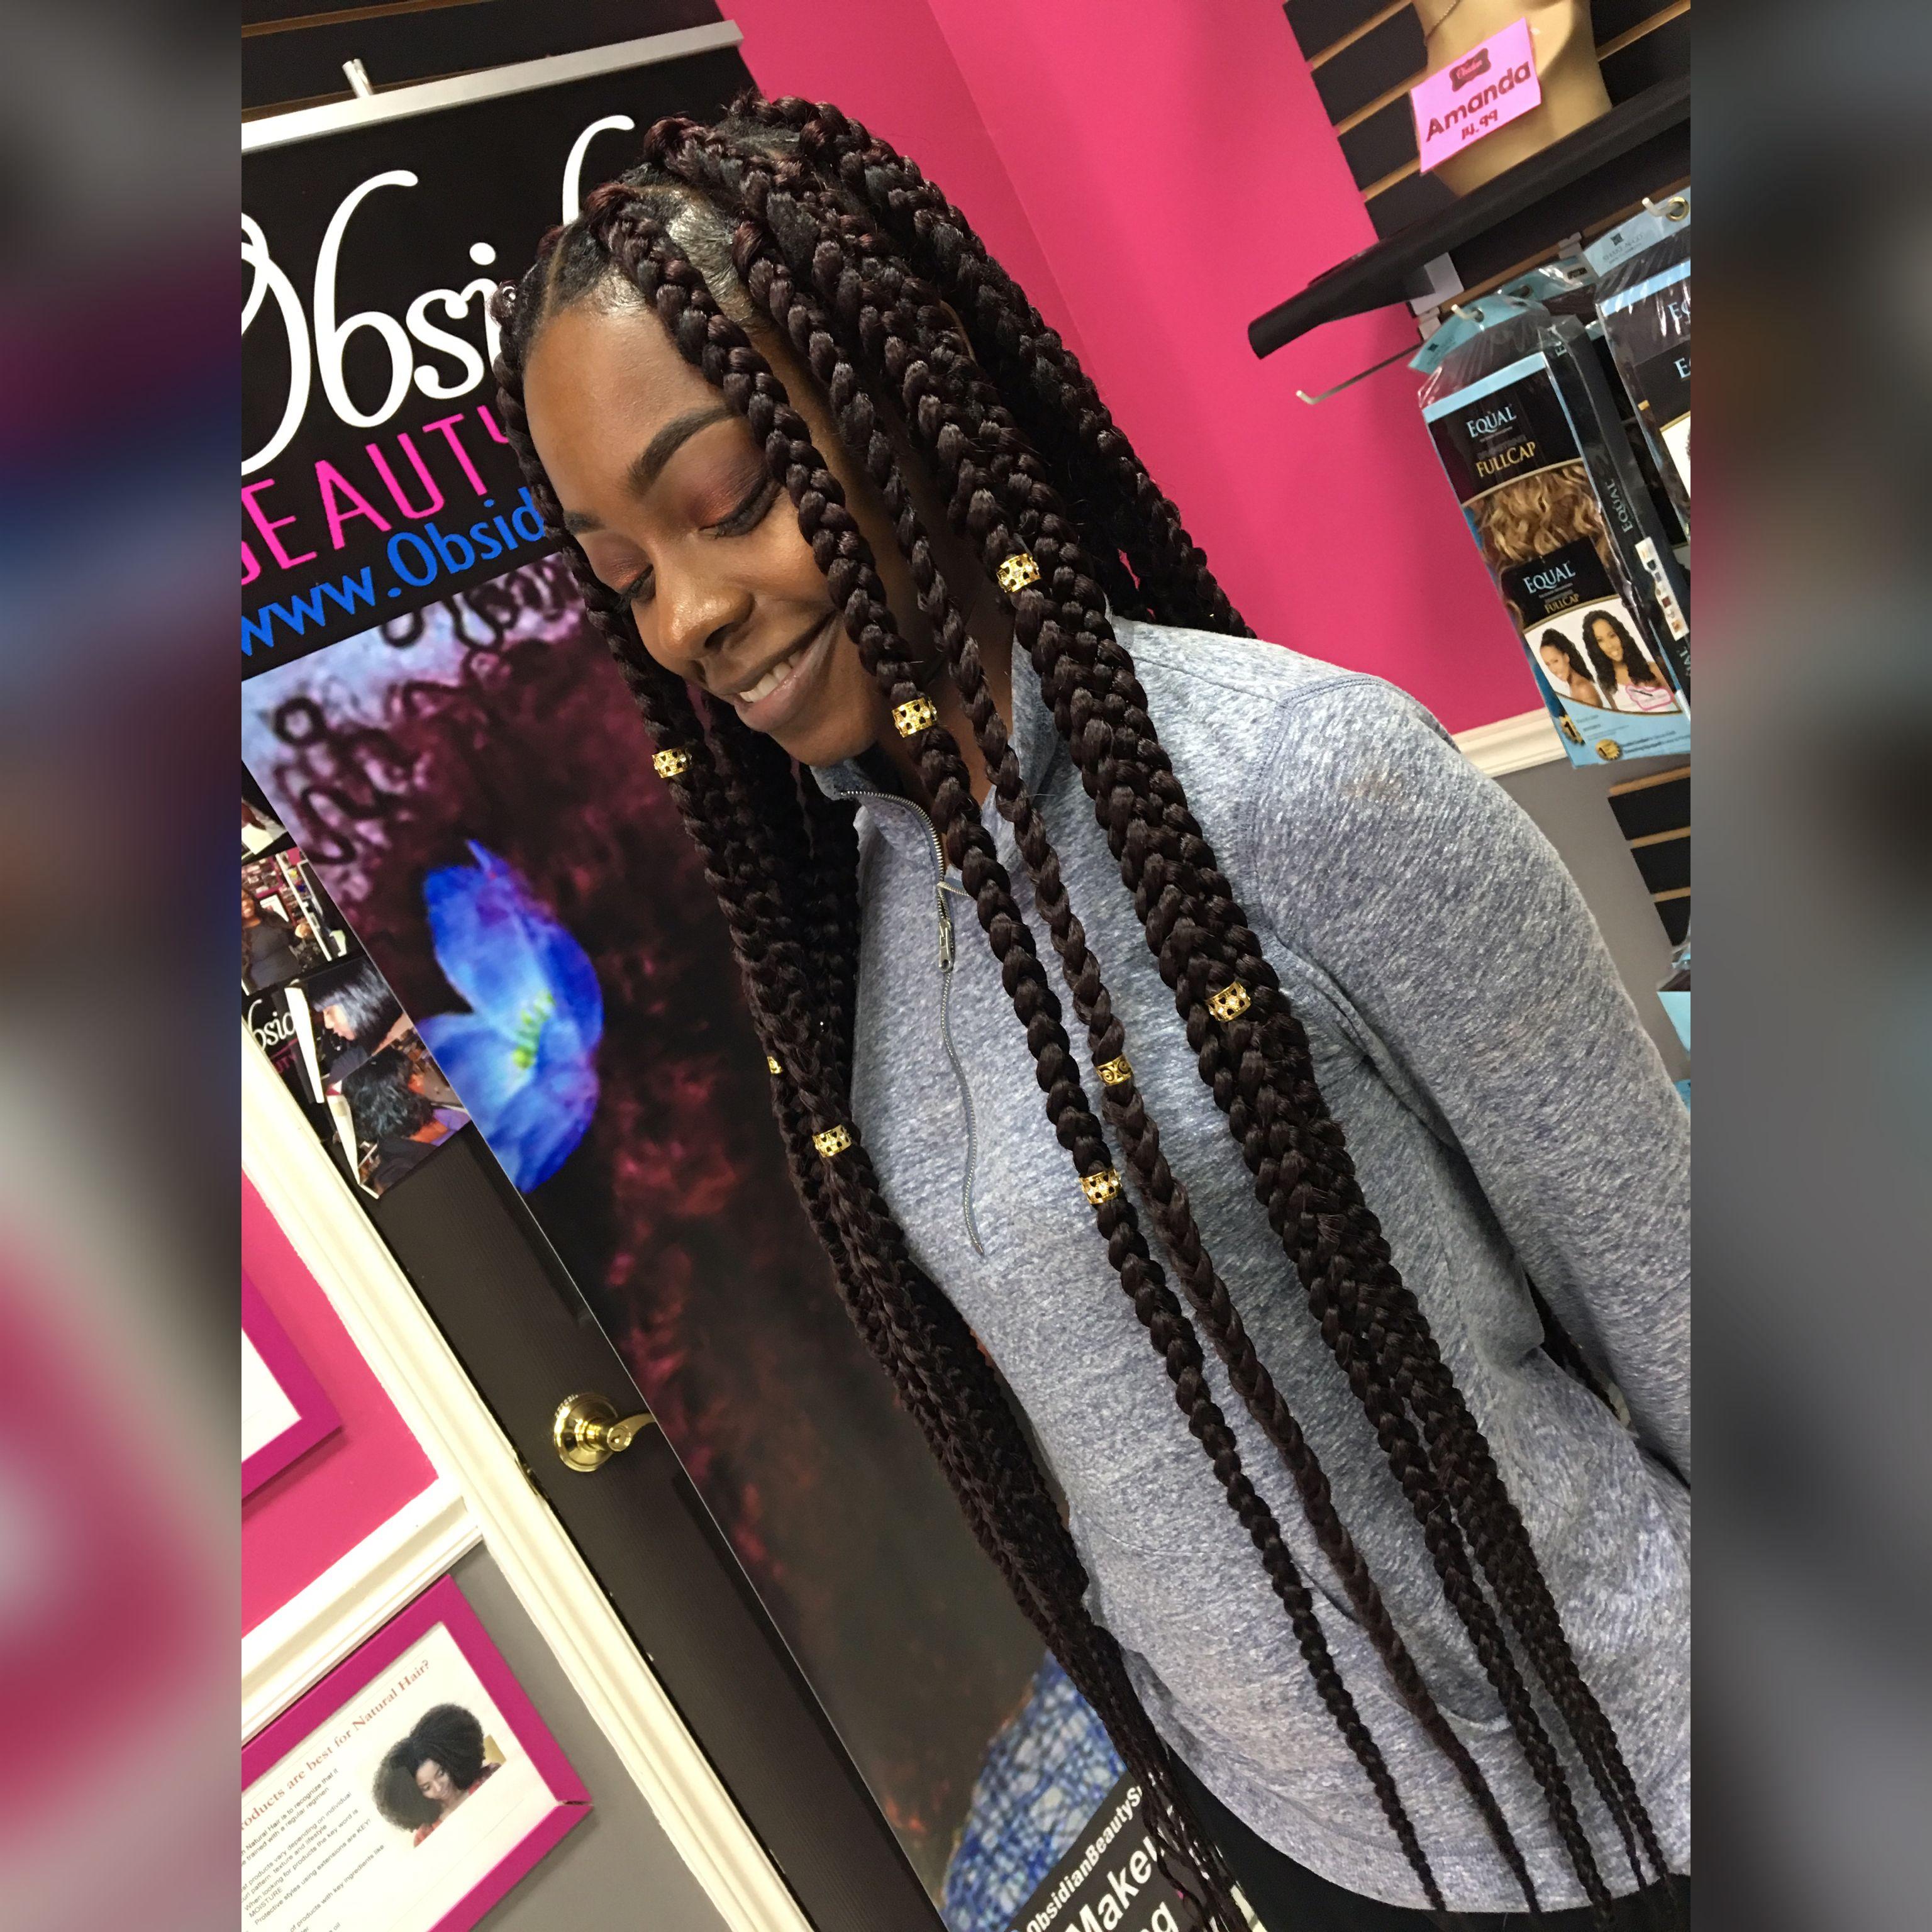 Pin By Hasana Aldridge On Hair Amp Hairaccessories In 2019